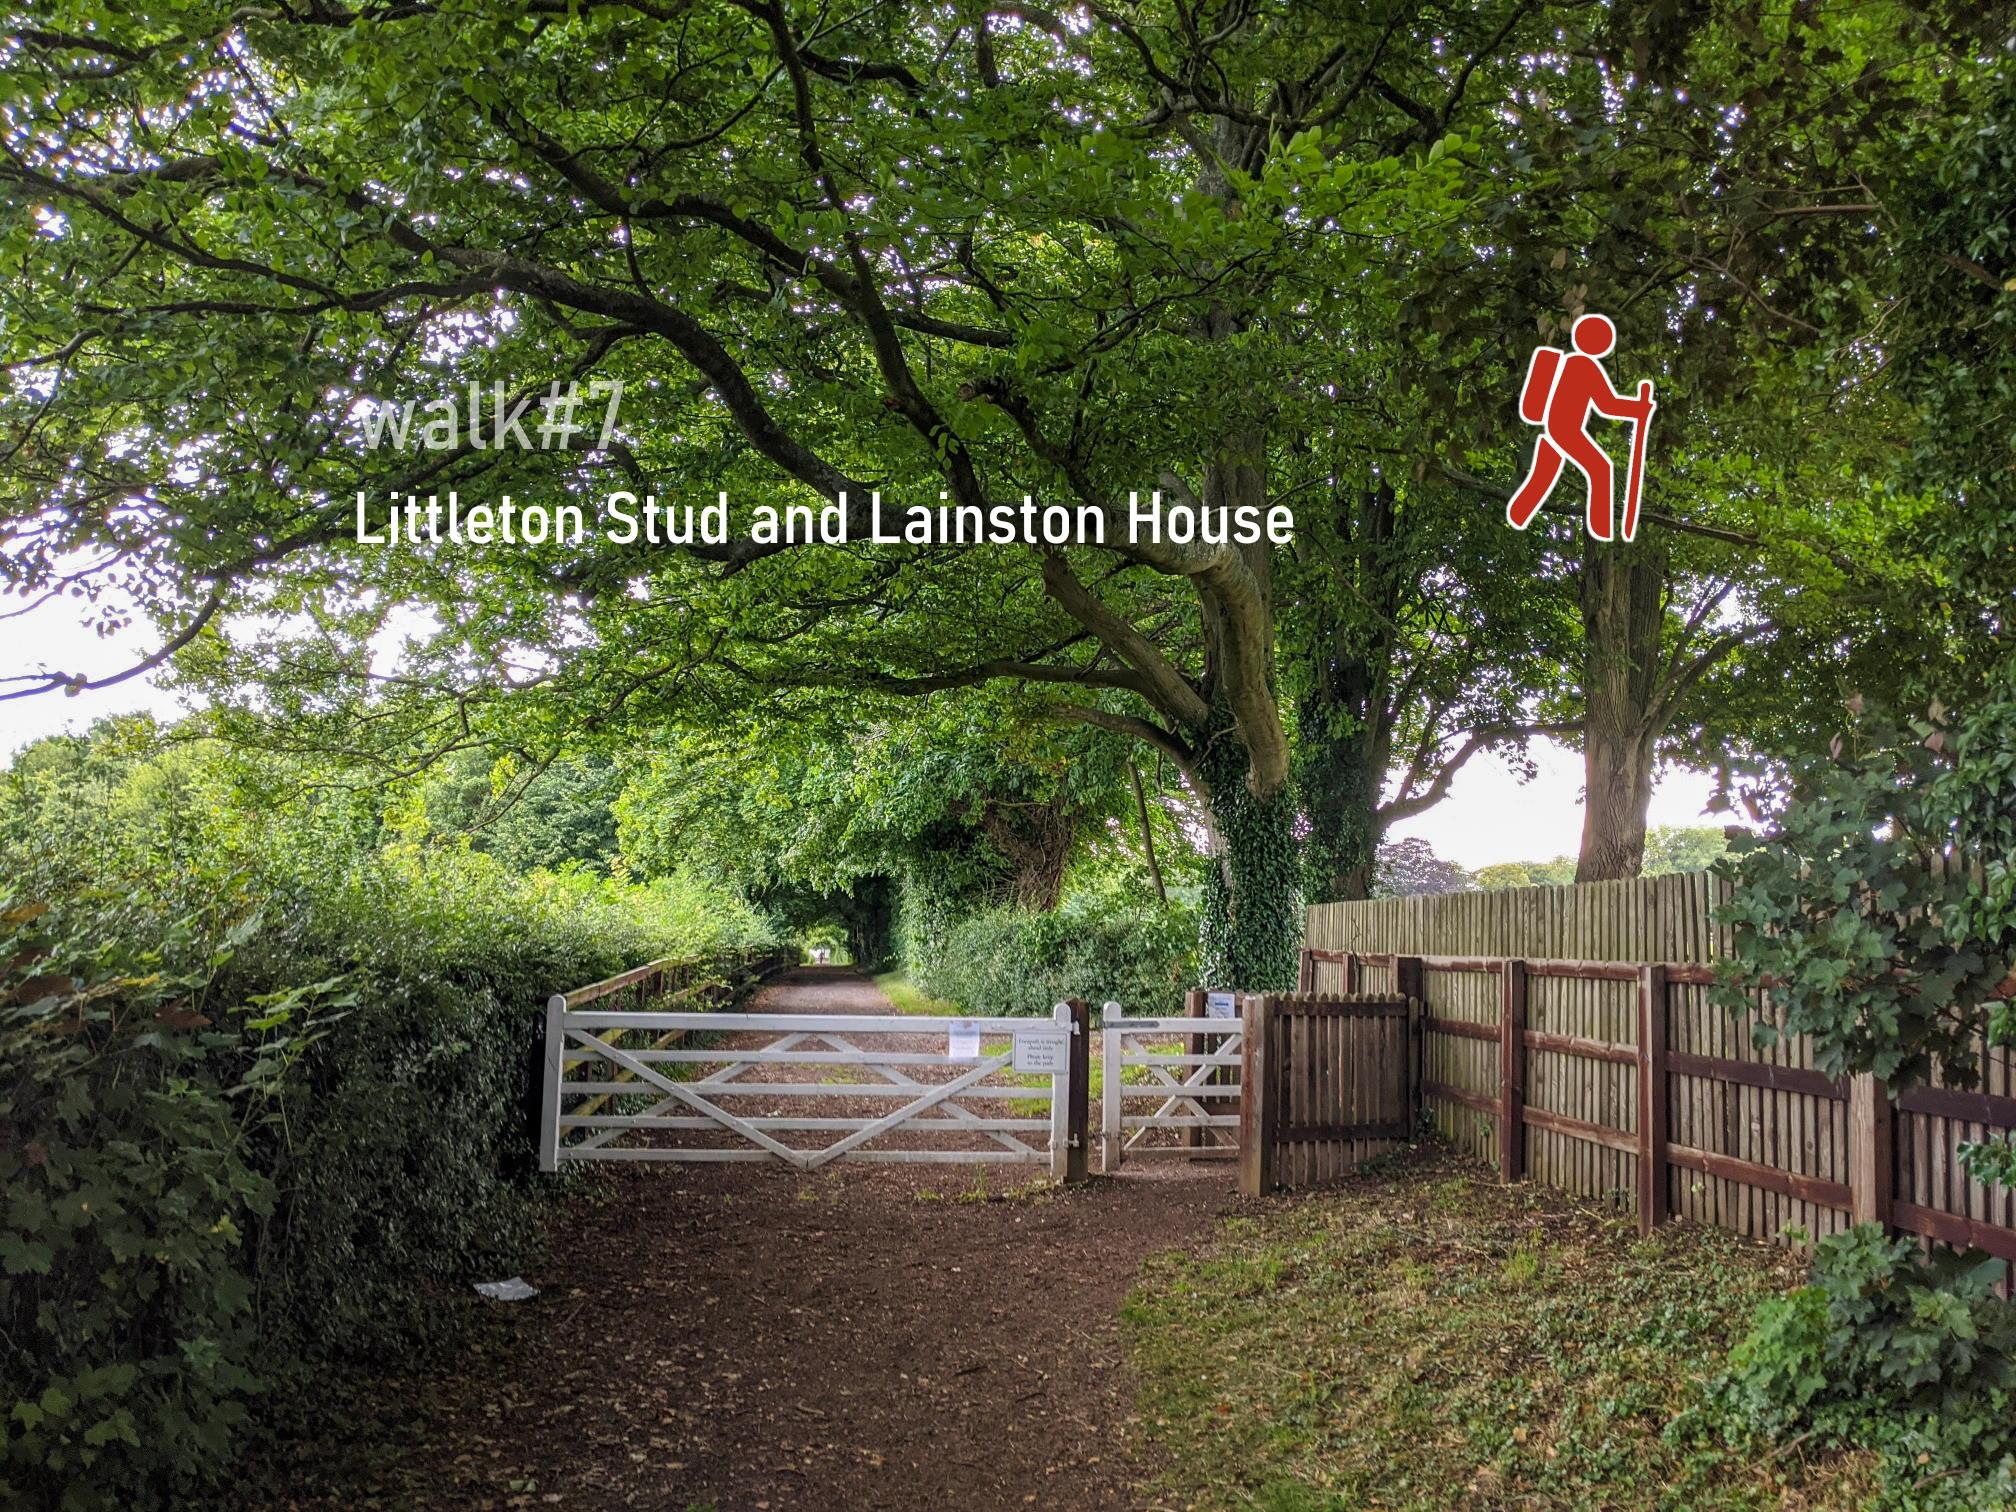 walk7 - Littleton Stud